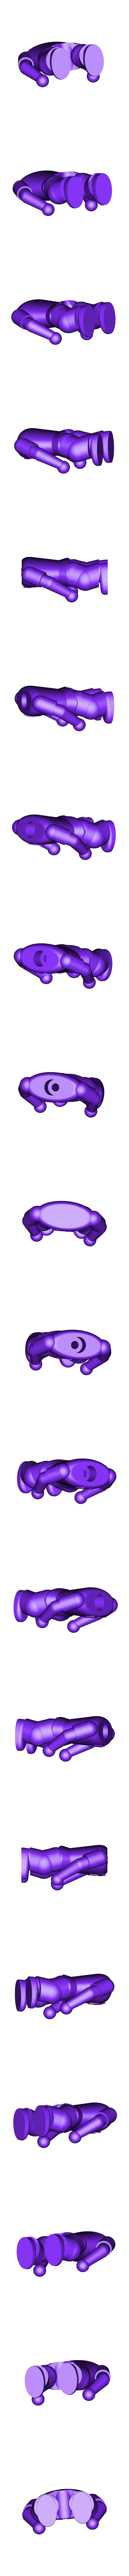 Body2.stl Download free STL file Bobble Head • Model to 3D print, wjordan819